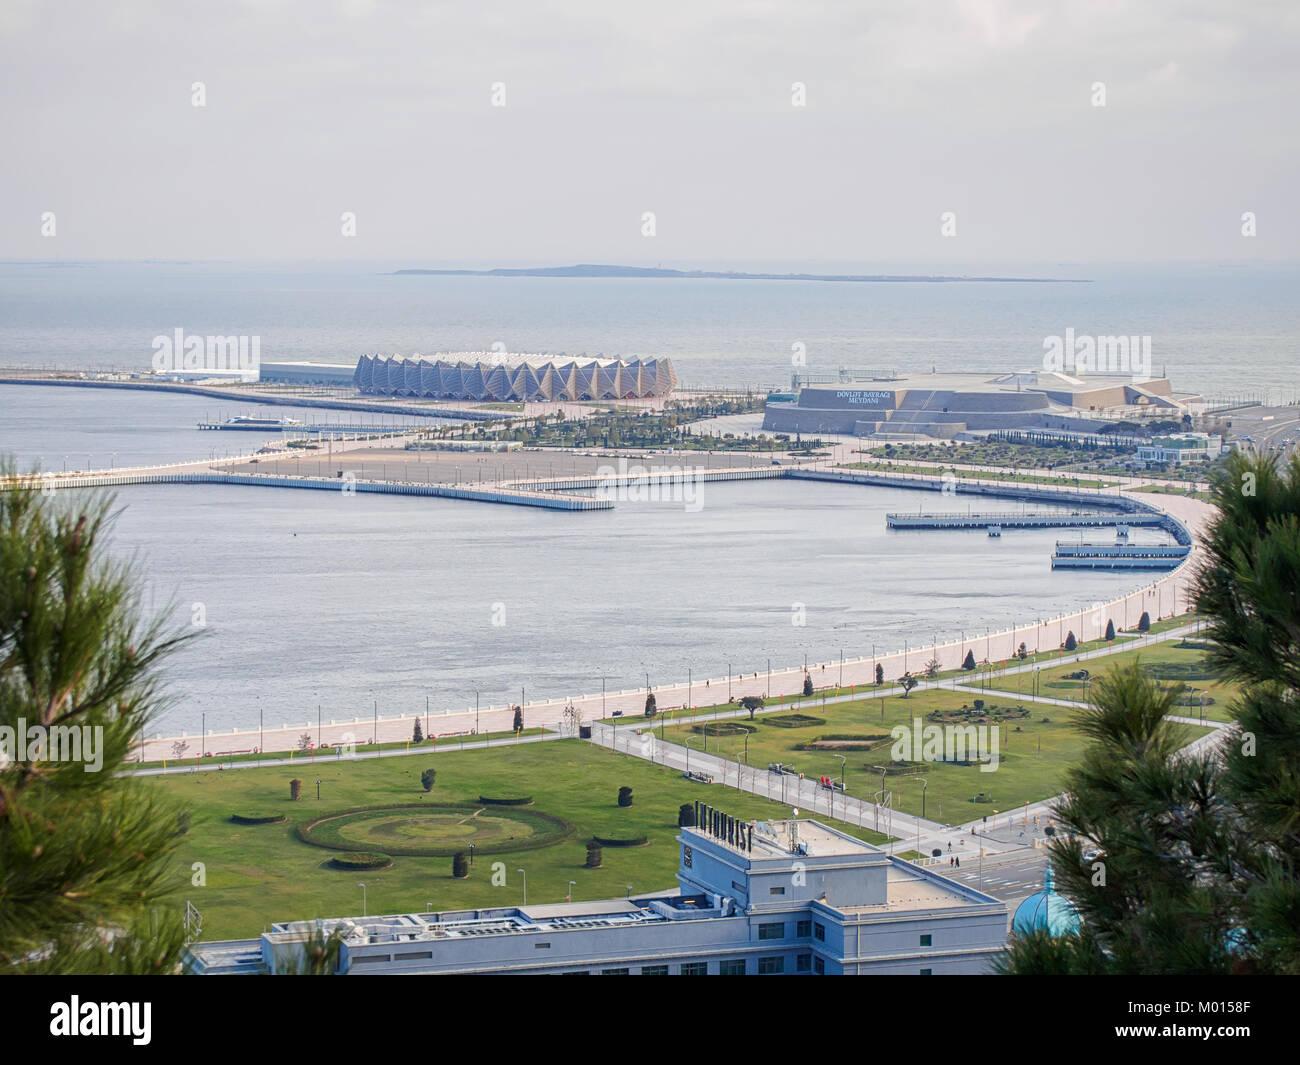 BAKU, AZERBAIJAN-DECEMBER 28, 2017: Panorama of the Baku. View frome above on the Crystal Hall. Stock Photo